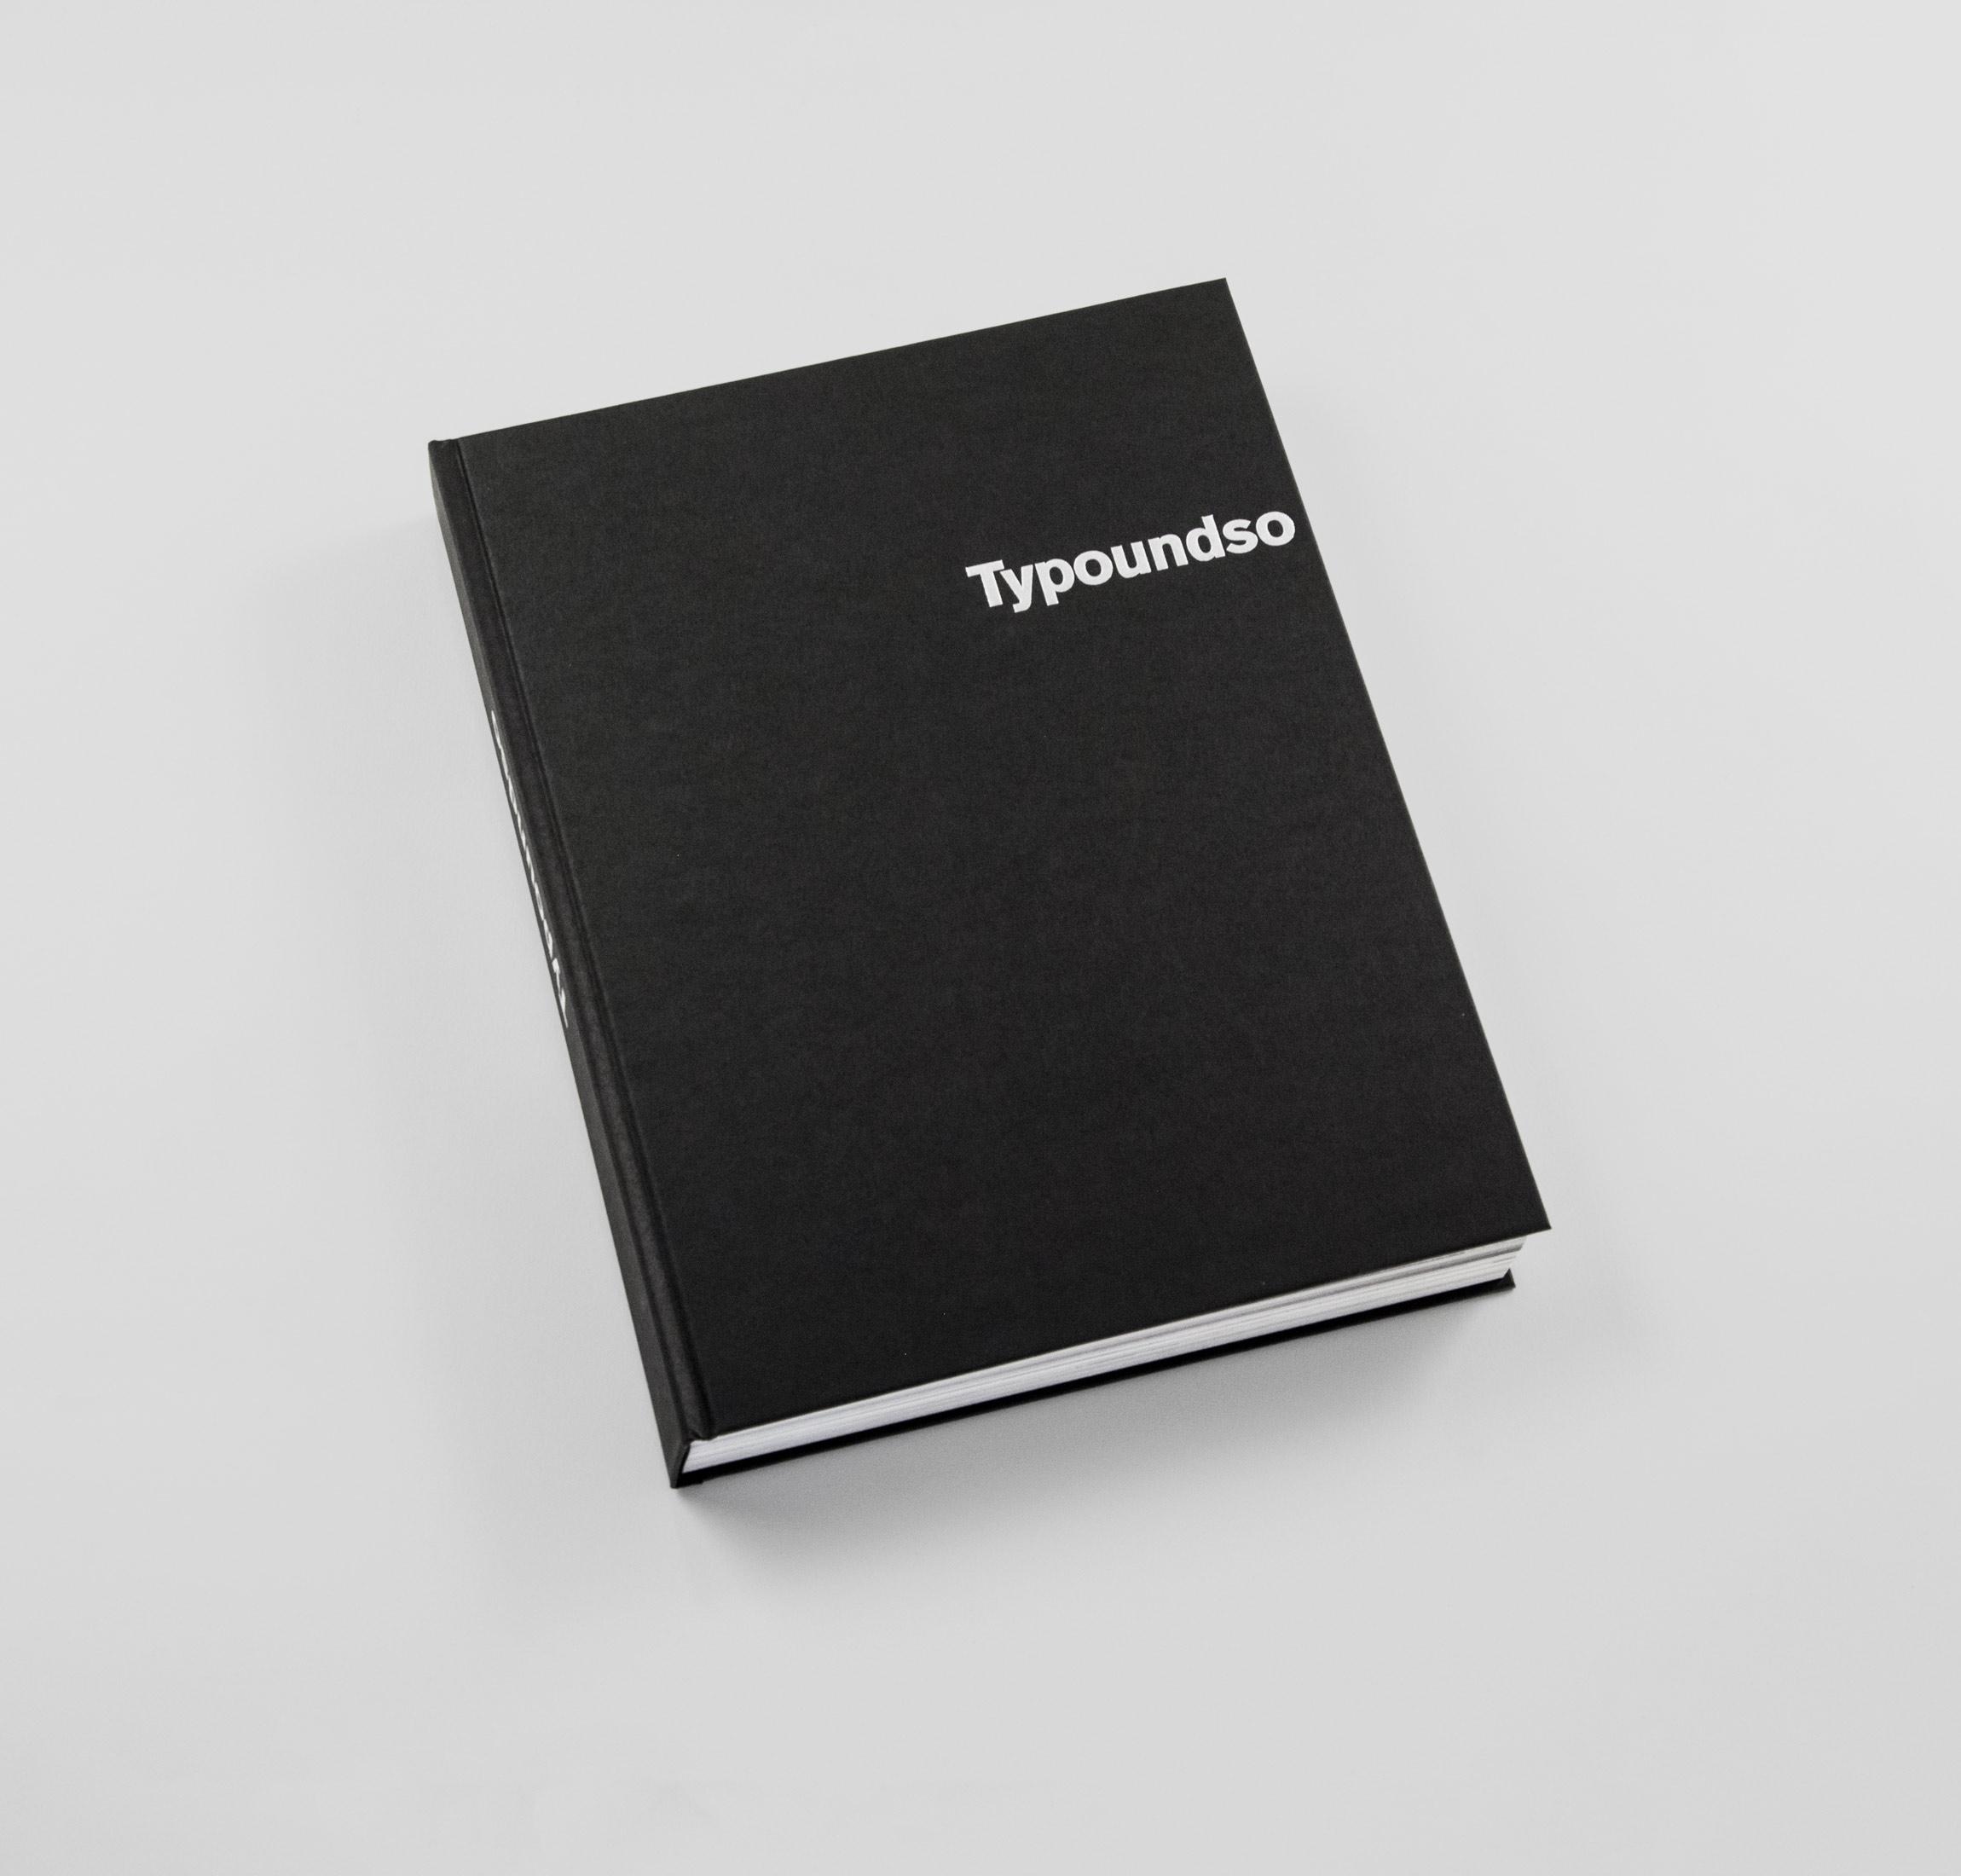 Edition Typoundso Typoundso Hansrudolf Lutz